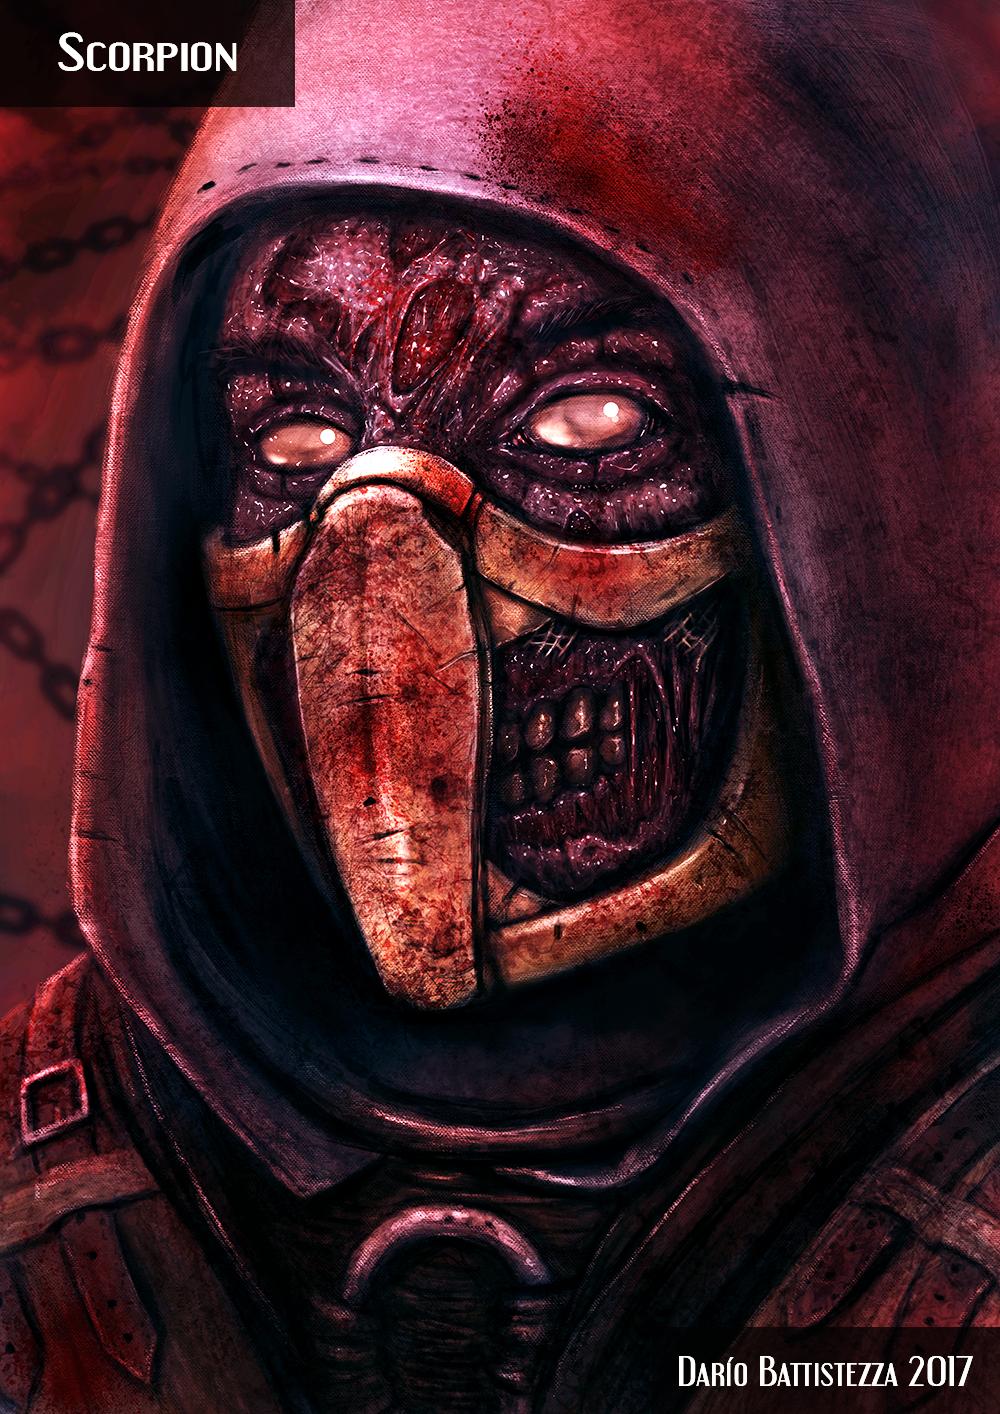 Scorpion Zombie MOD - Mortal Kombat X